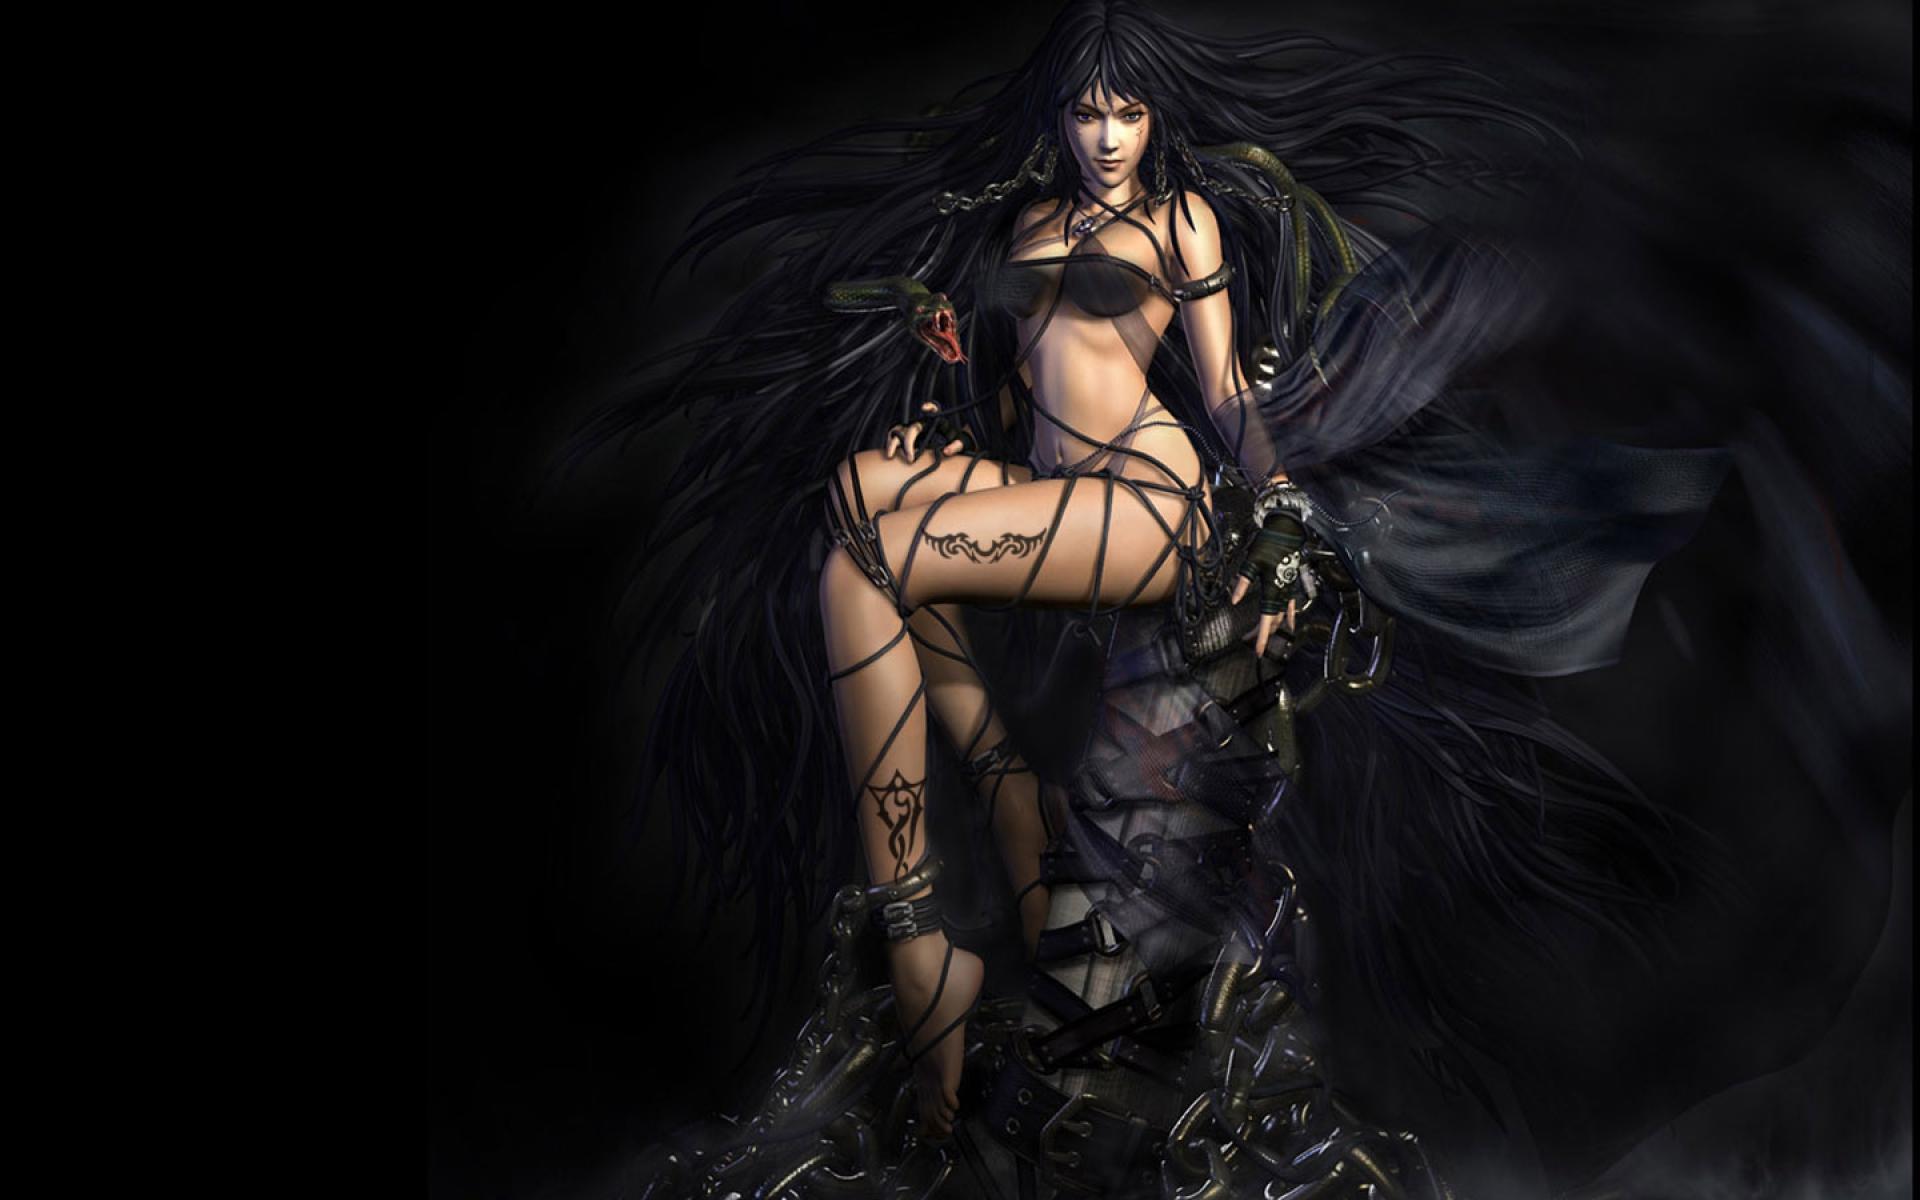 Sexy nude girls fantacy art xxx download